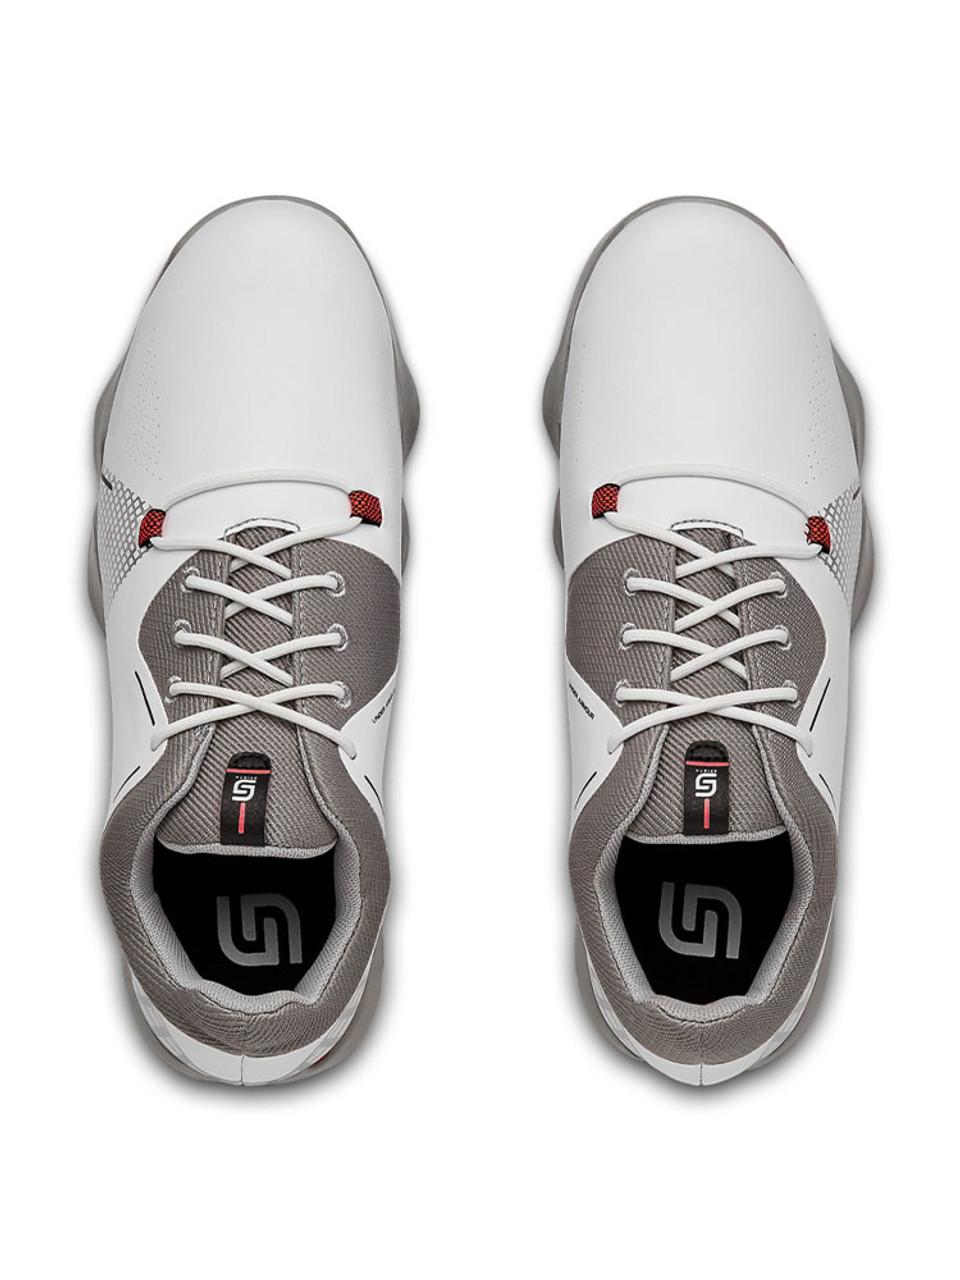 boys under armour slip on shoes